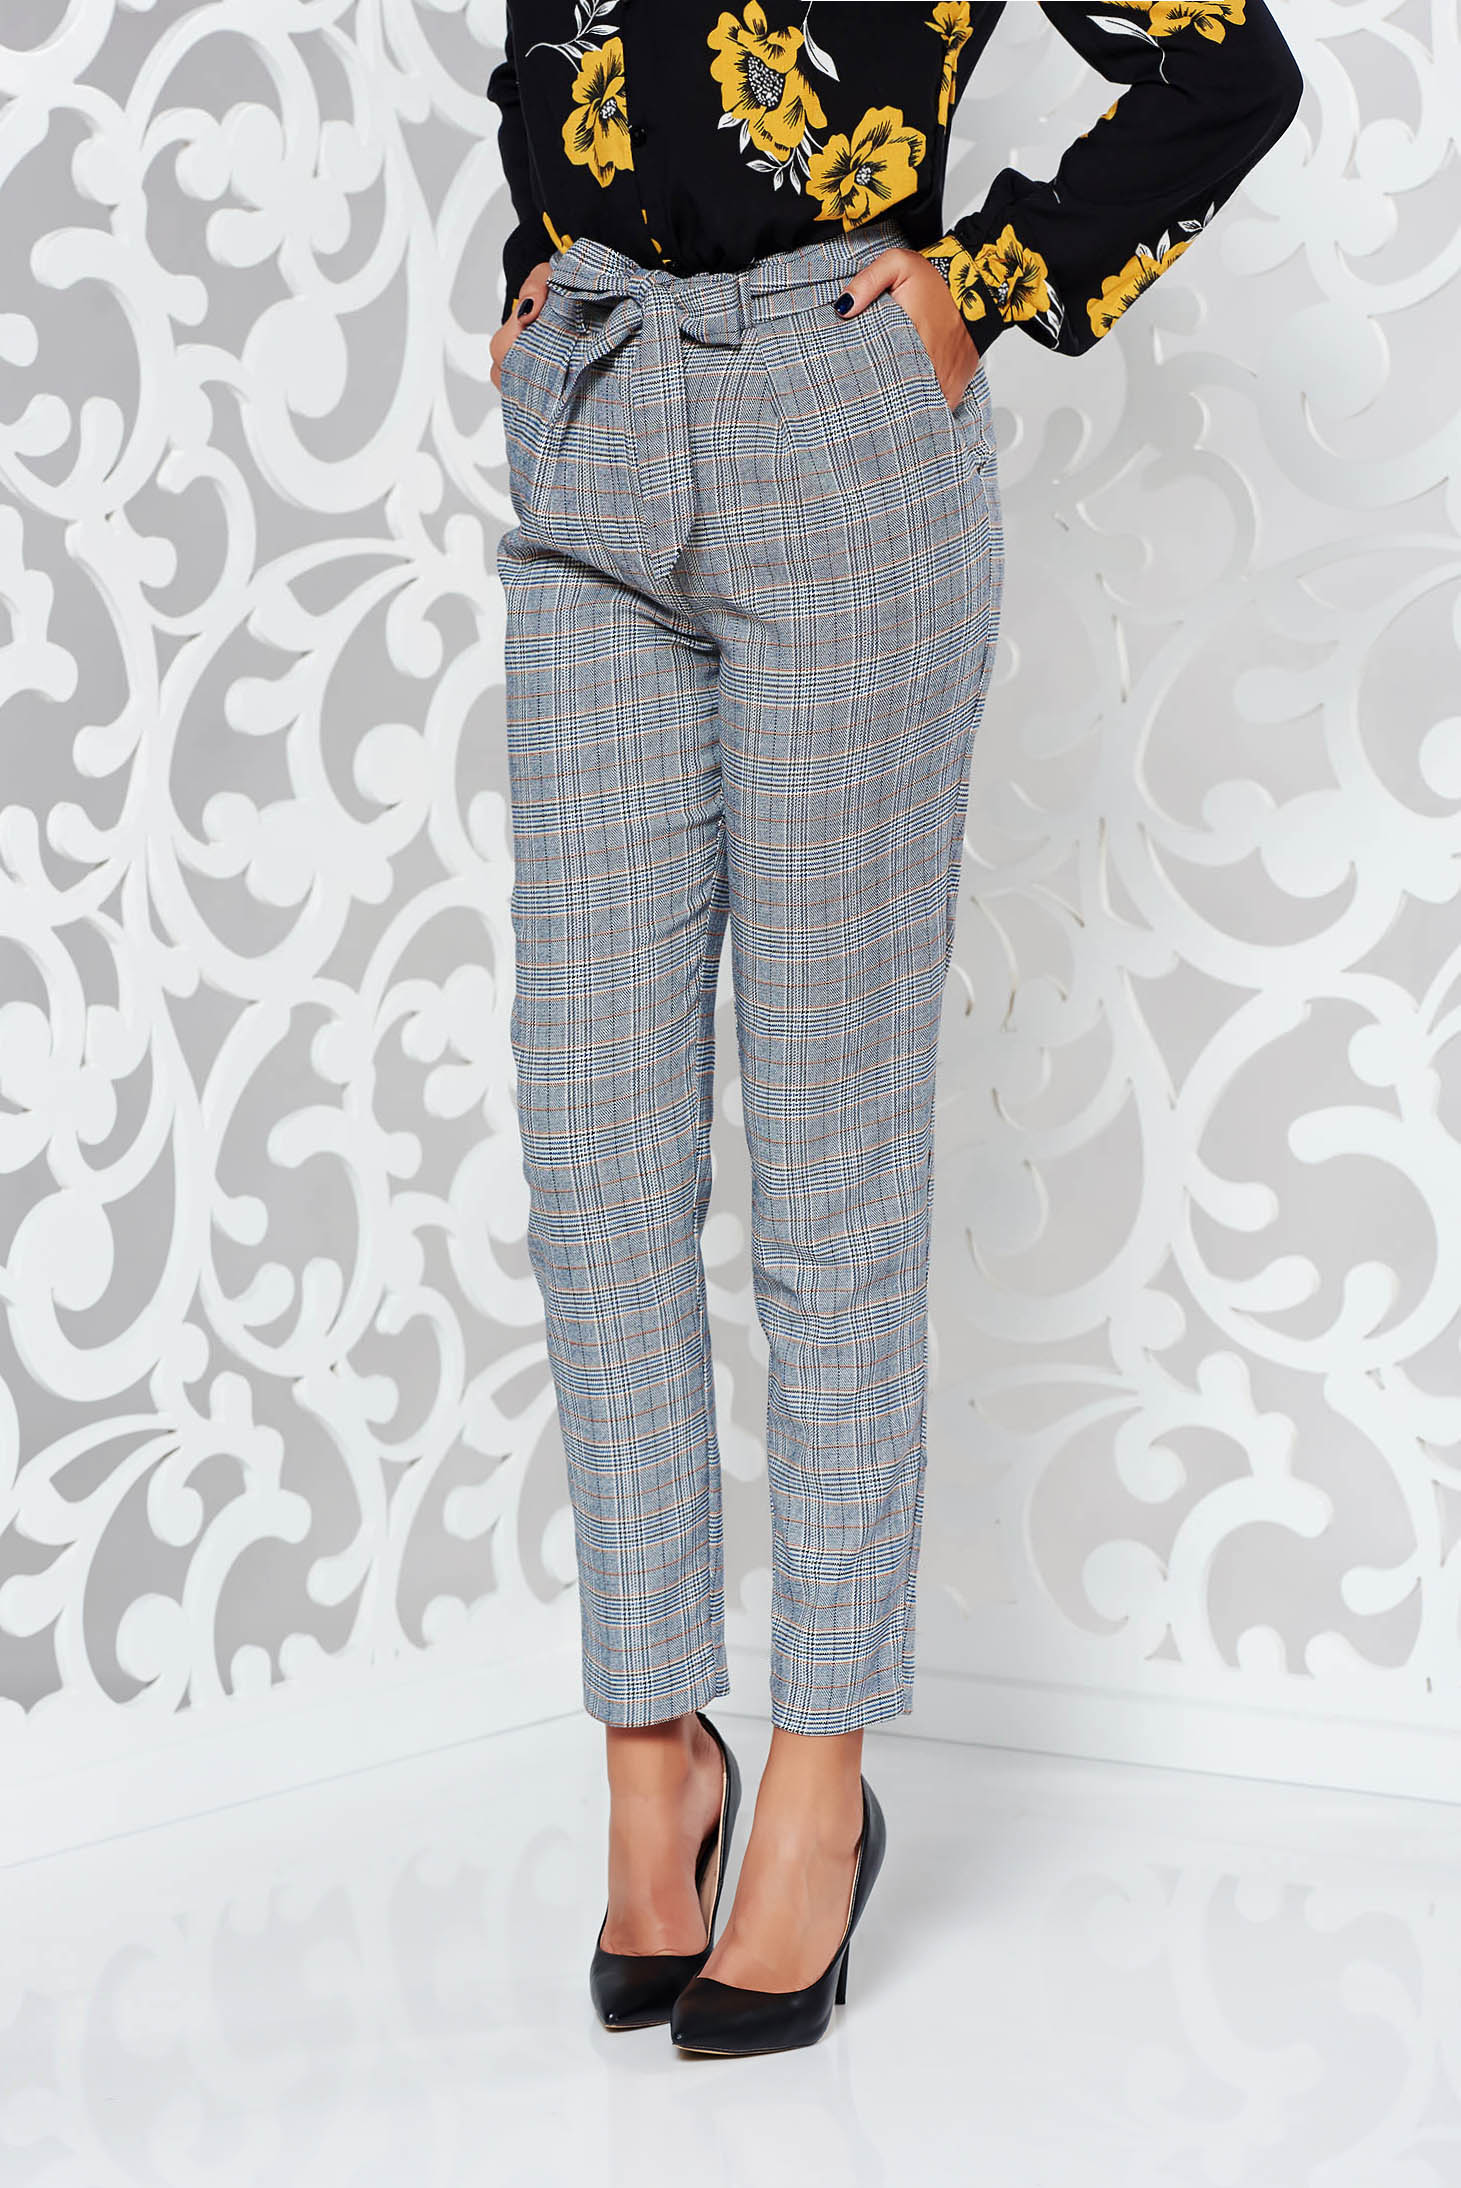 Pantaloni StarShinerS gri casual conici cu talie medie din stofa neelastica cu buzunare accesorizati cu cordon